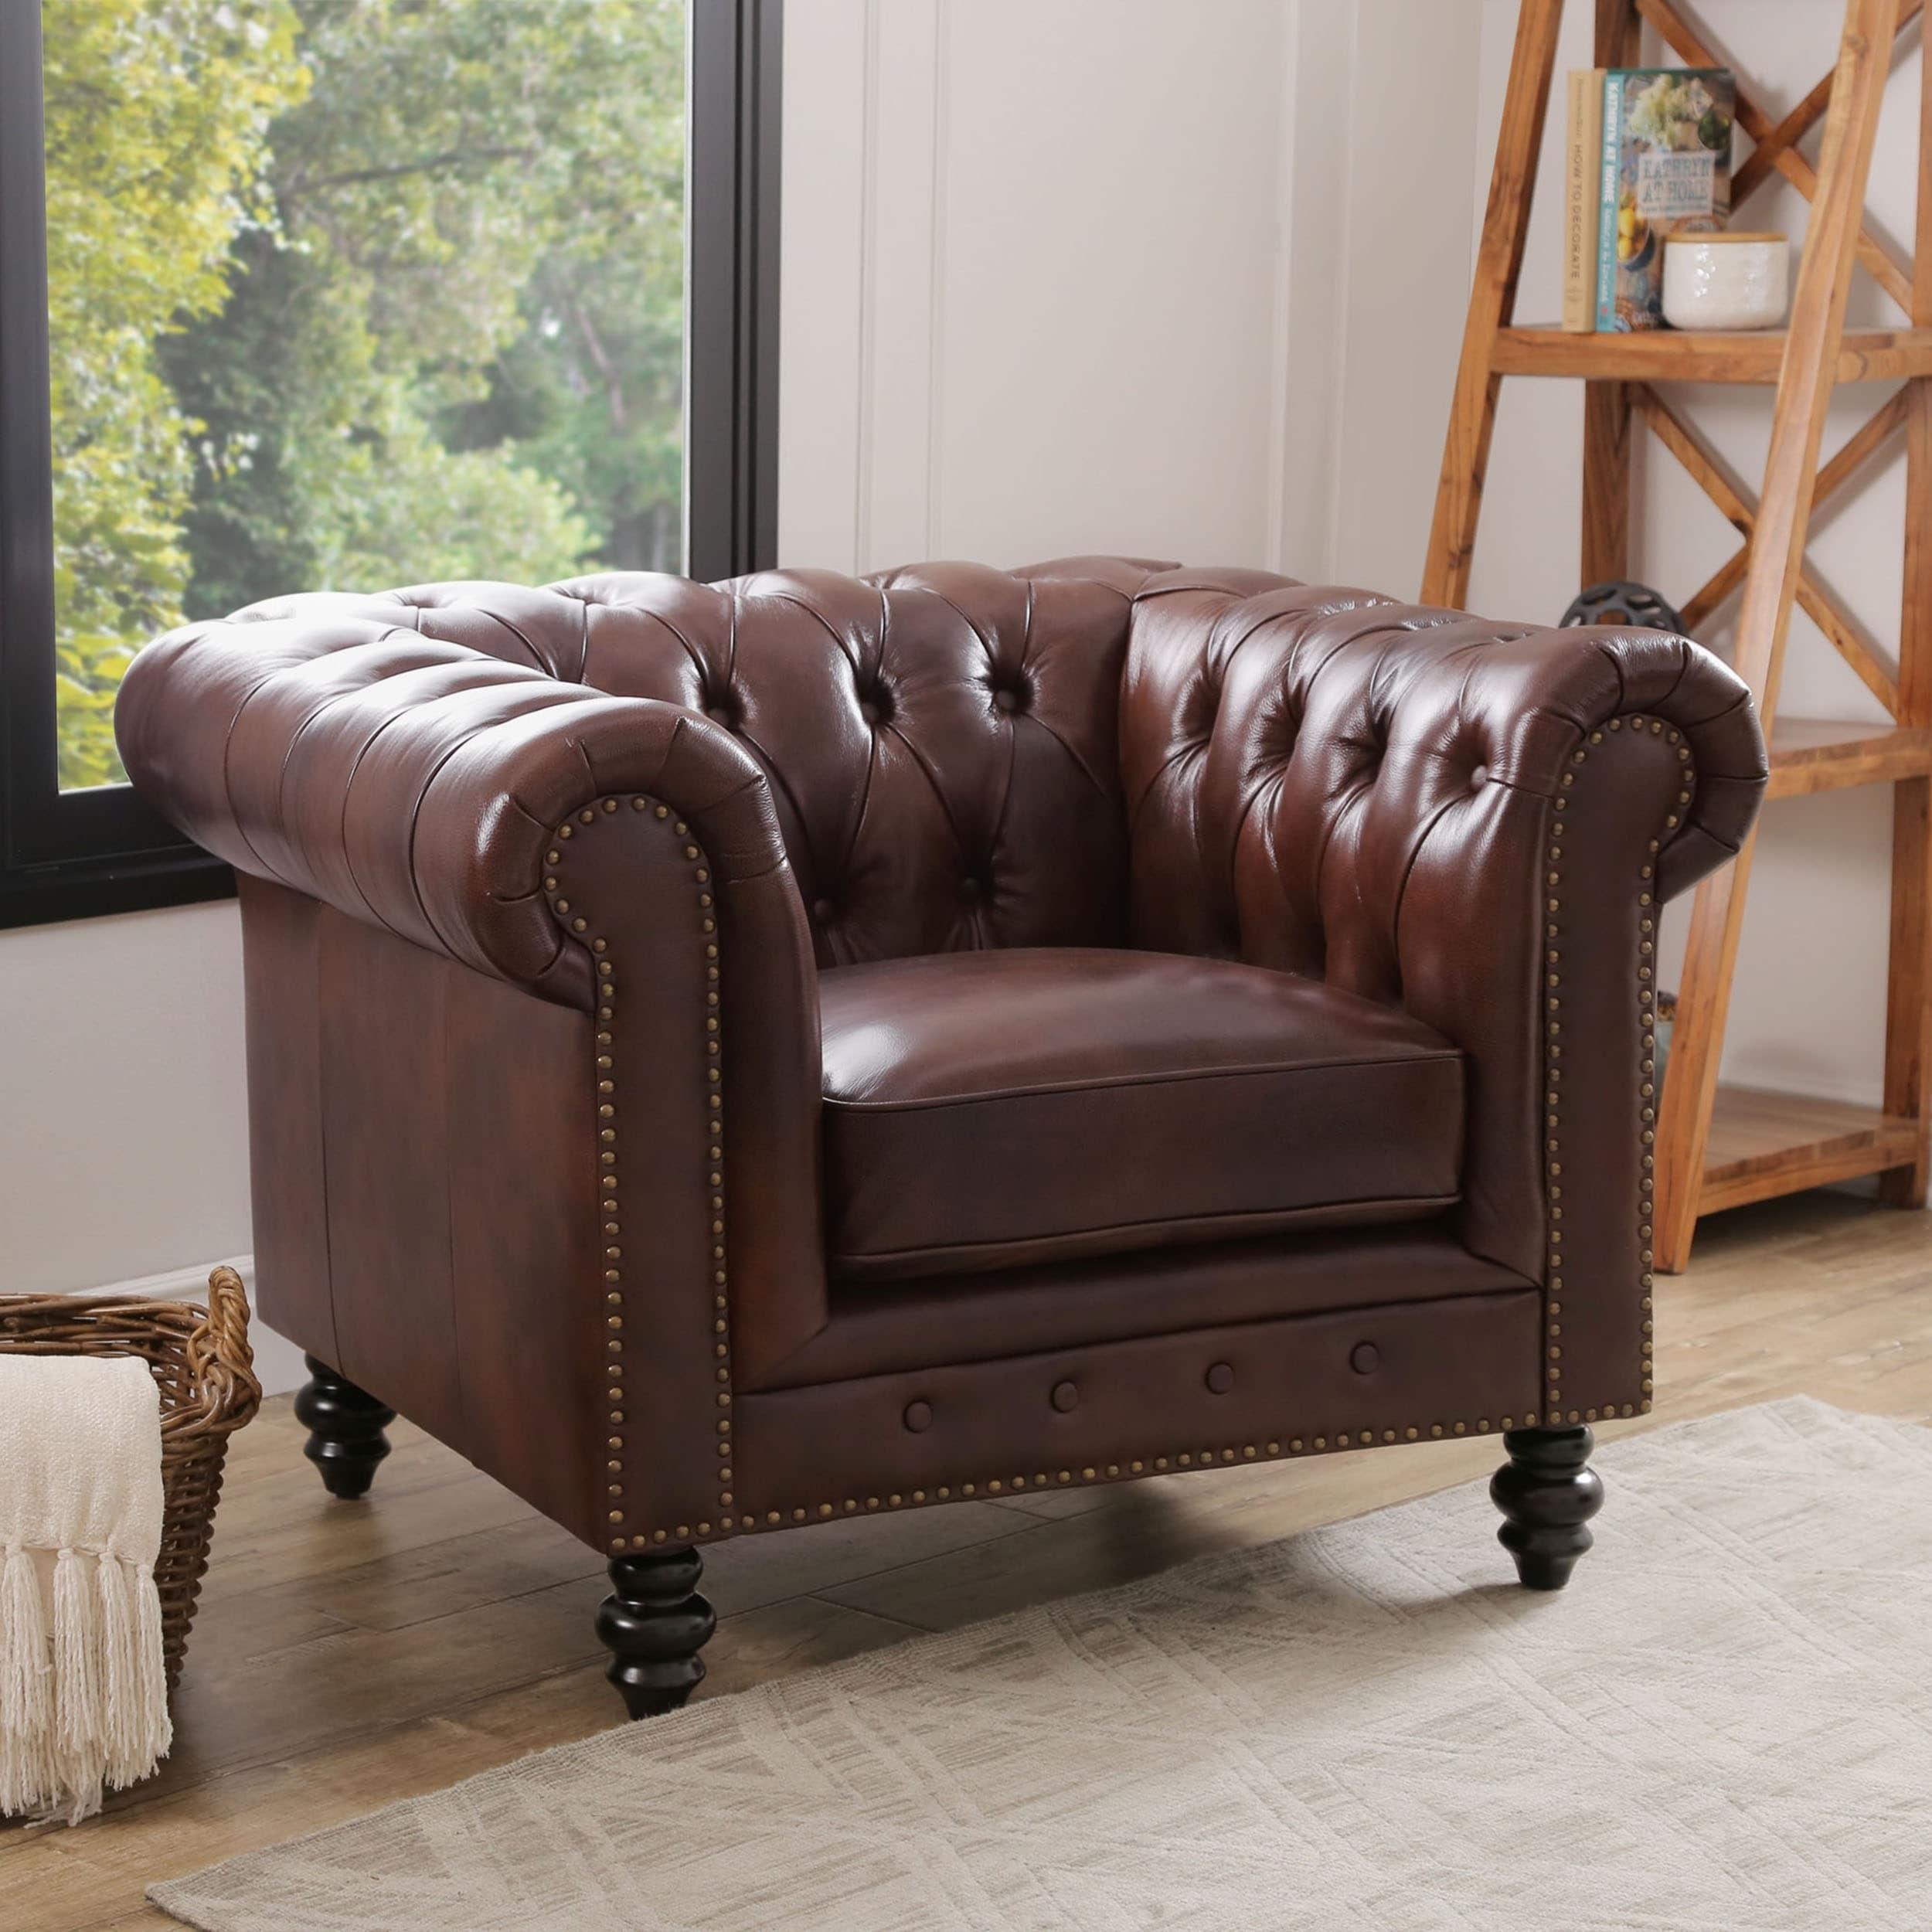 Shop Abbyson Grand Chesterfield Brown Top Grain Leather Armchair